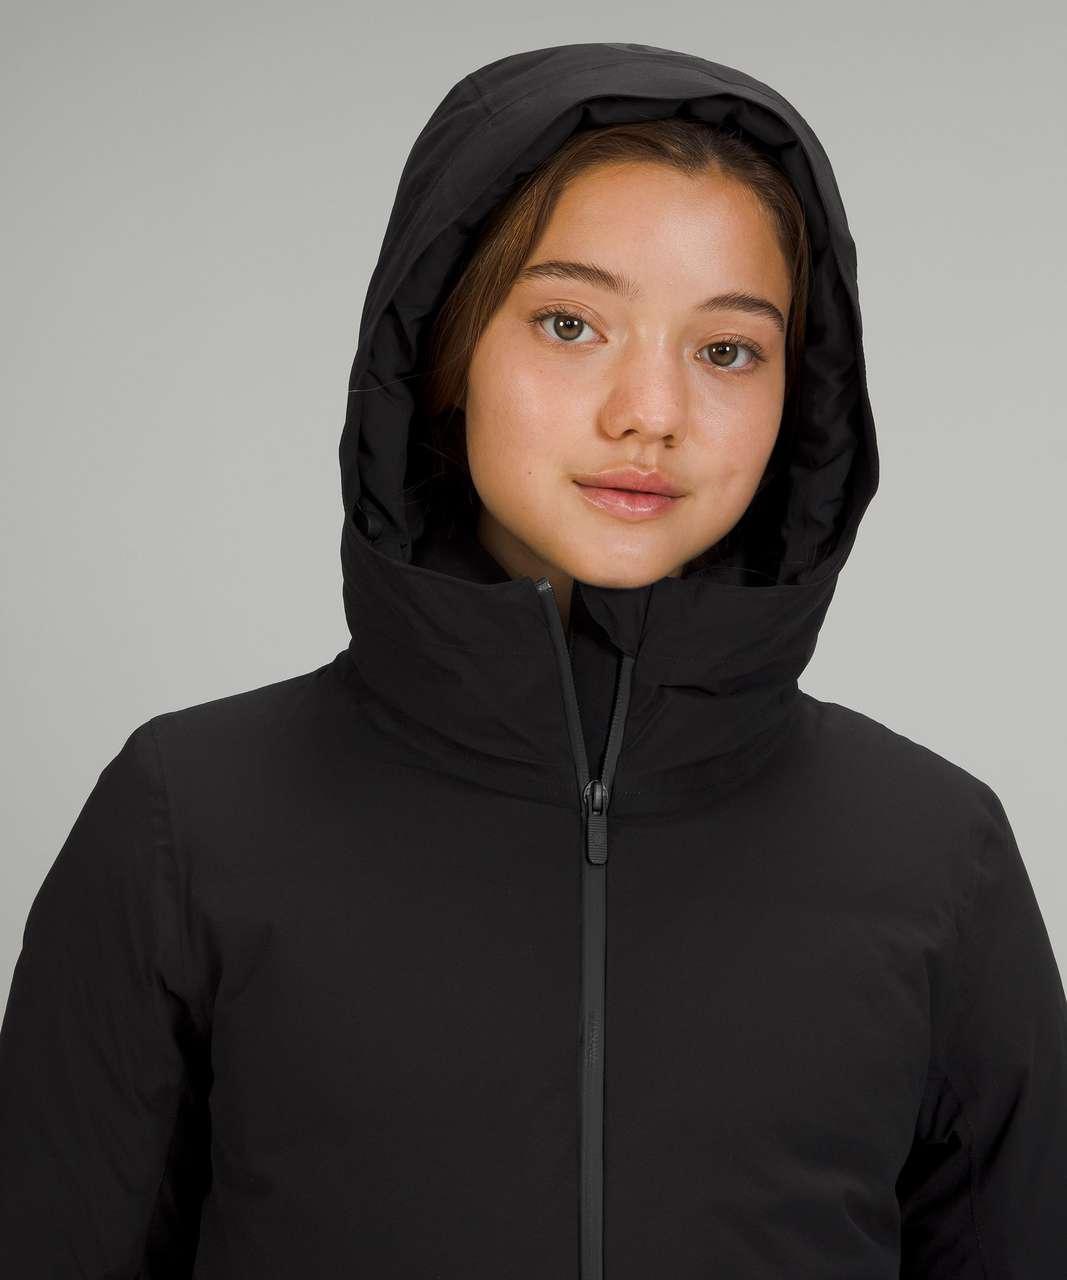 Lululemon Slush Hour Hooded Jacket - Black